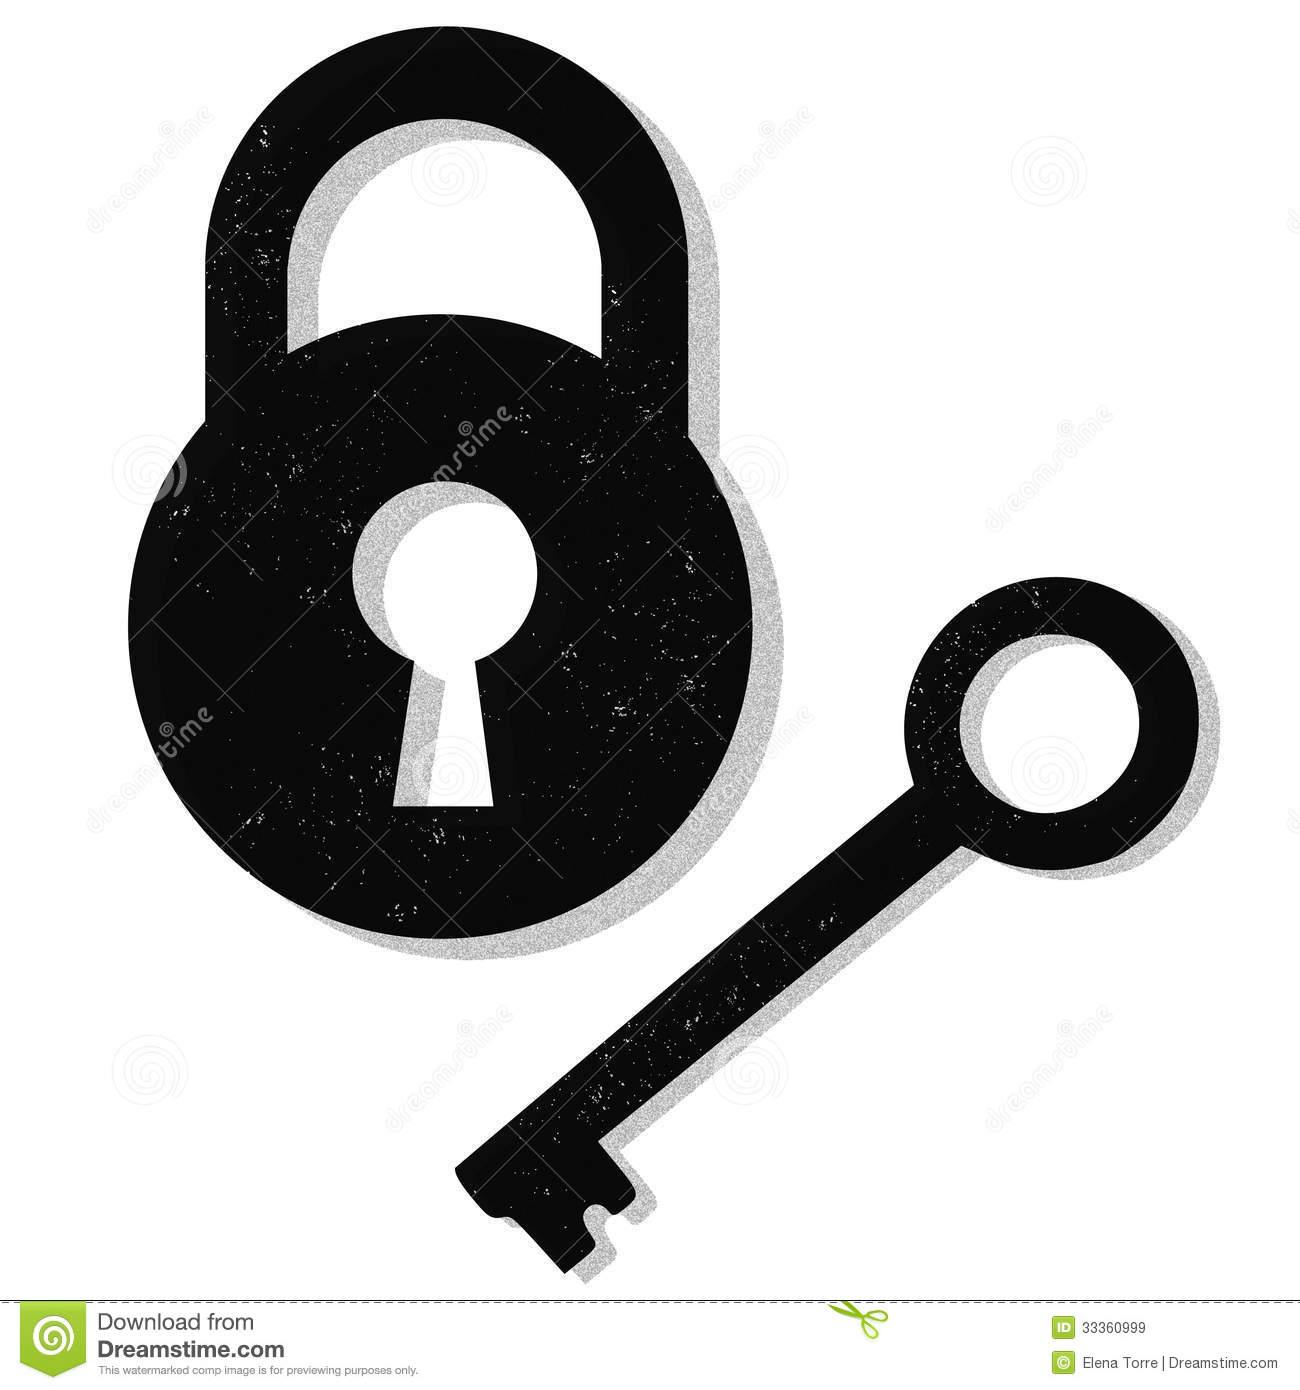 padlock and key clipart - photo #21